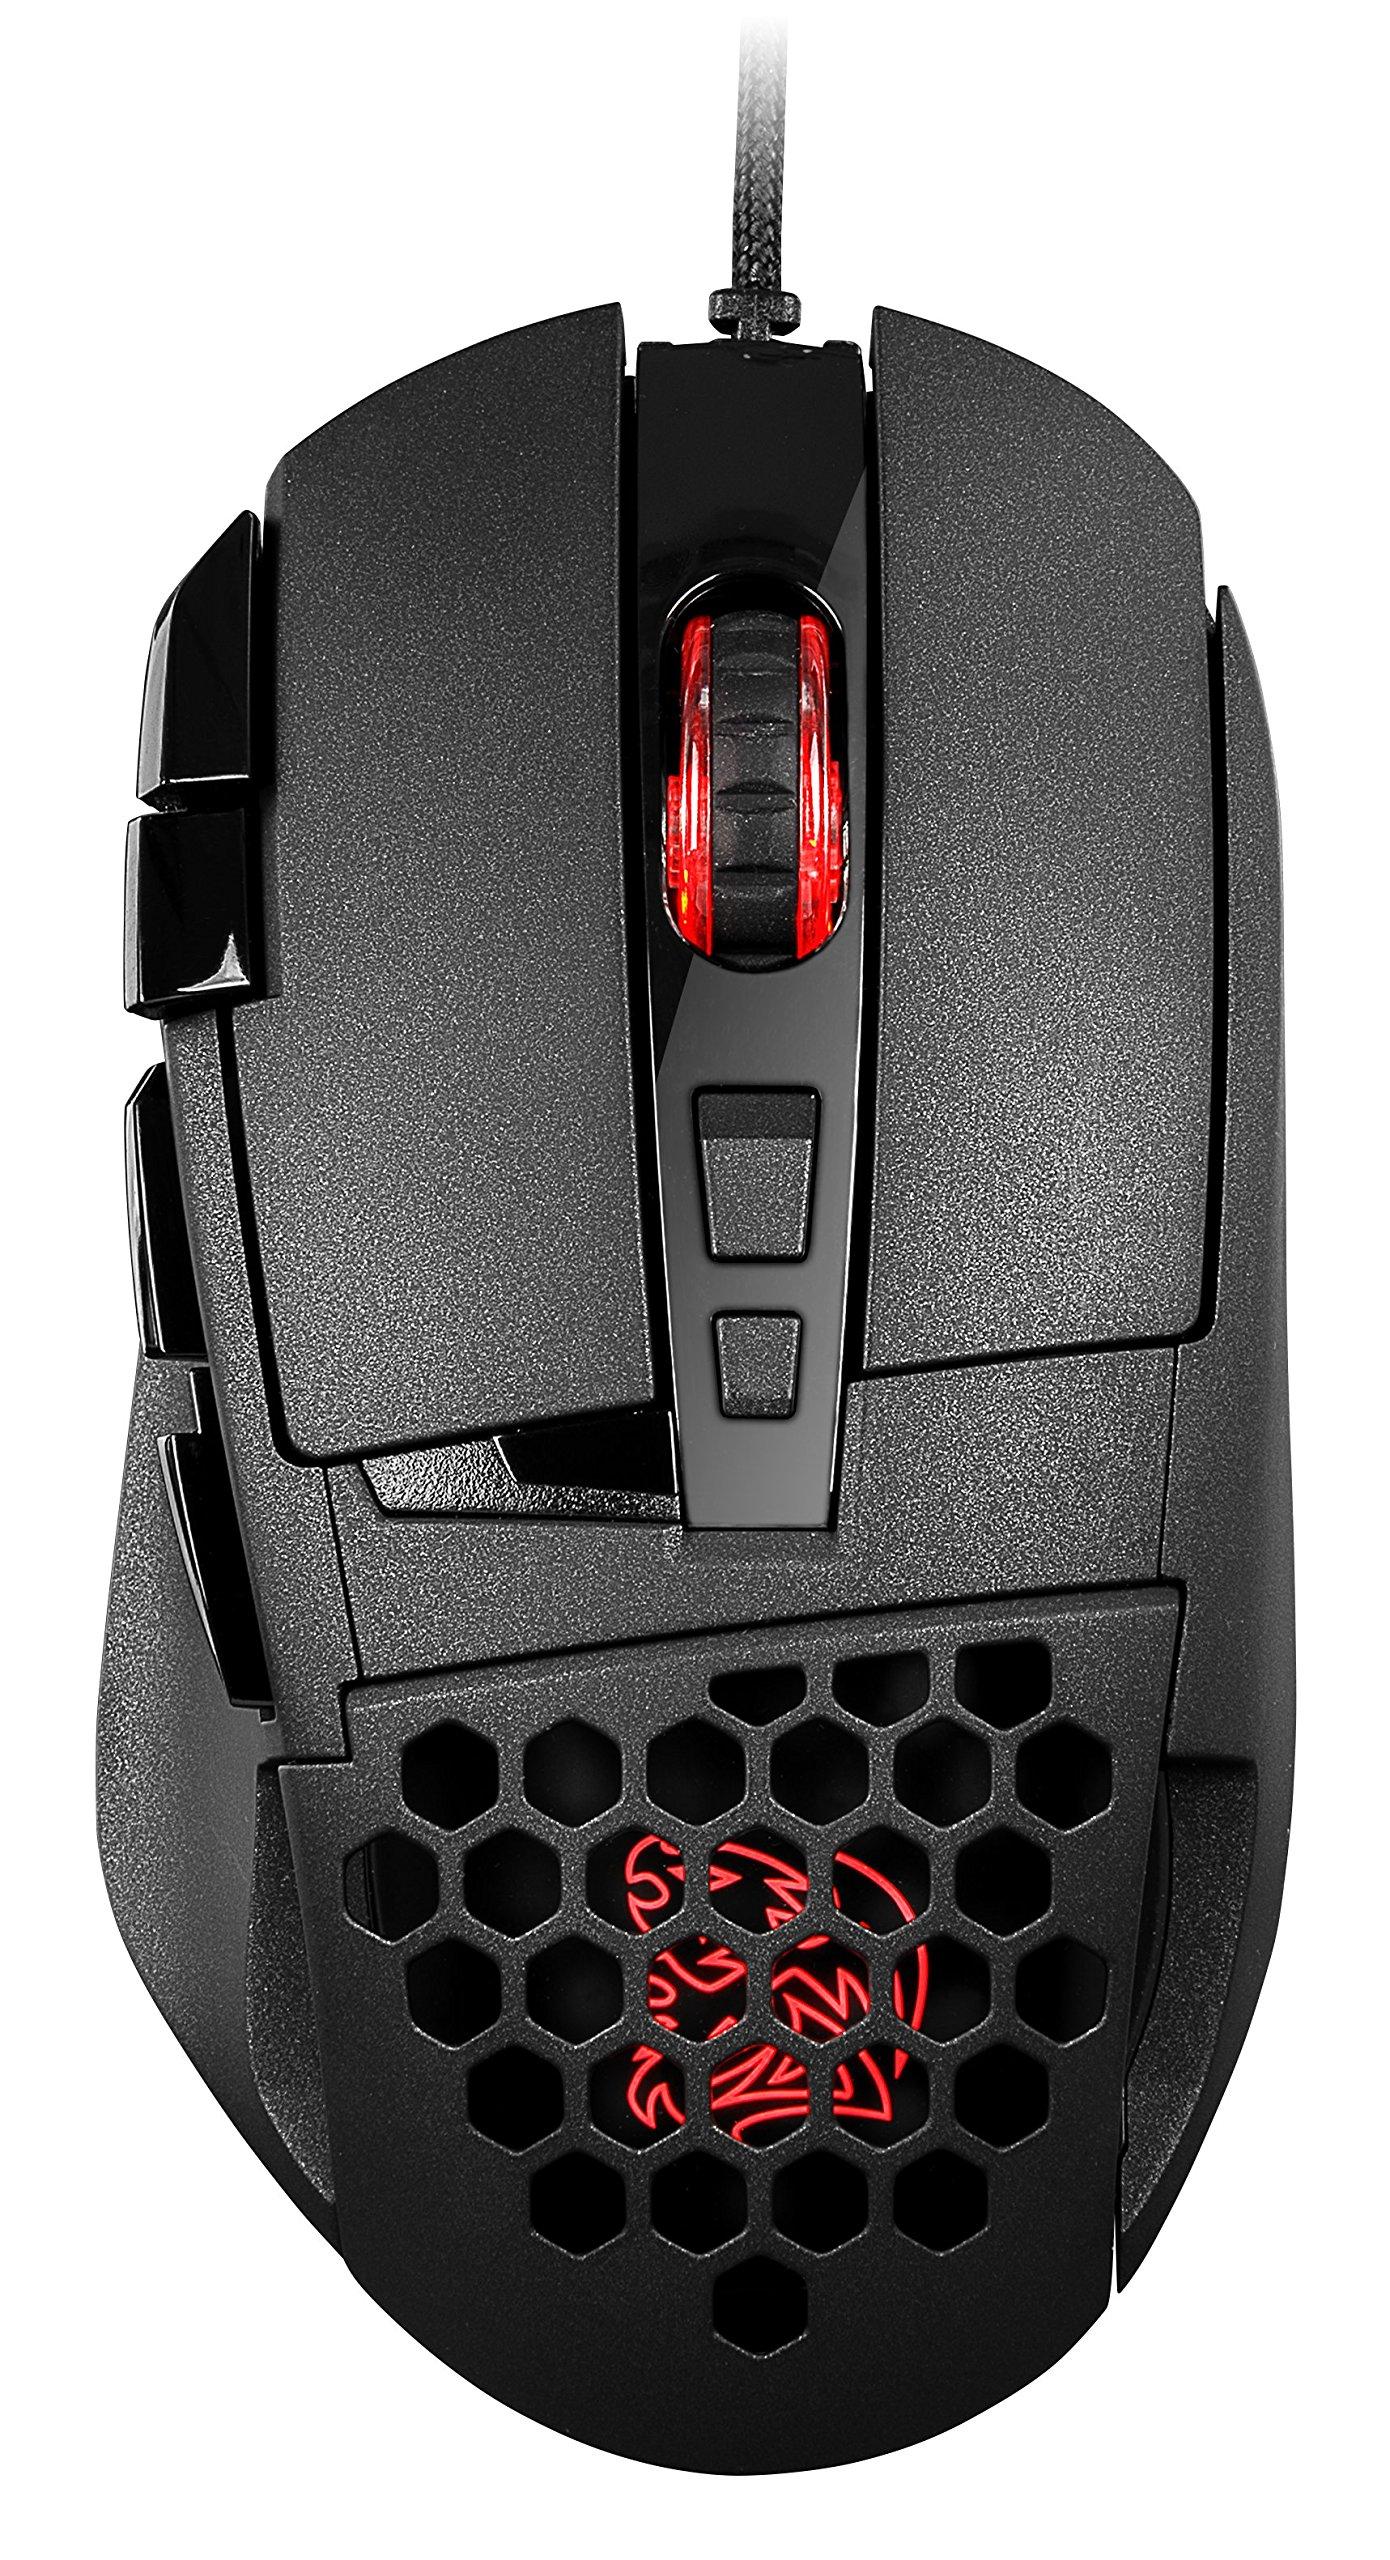 Mouse Gamer :  Thermaltake Tt e Sports Ventus Z 11000 DPI 16